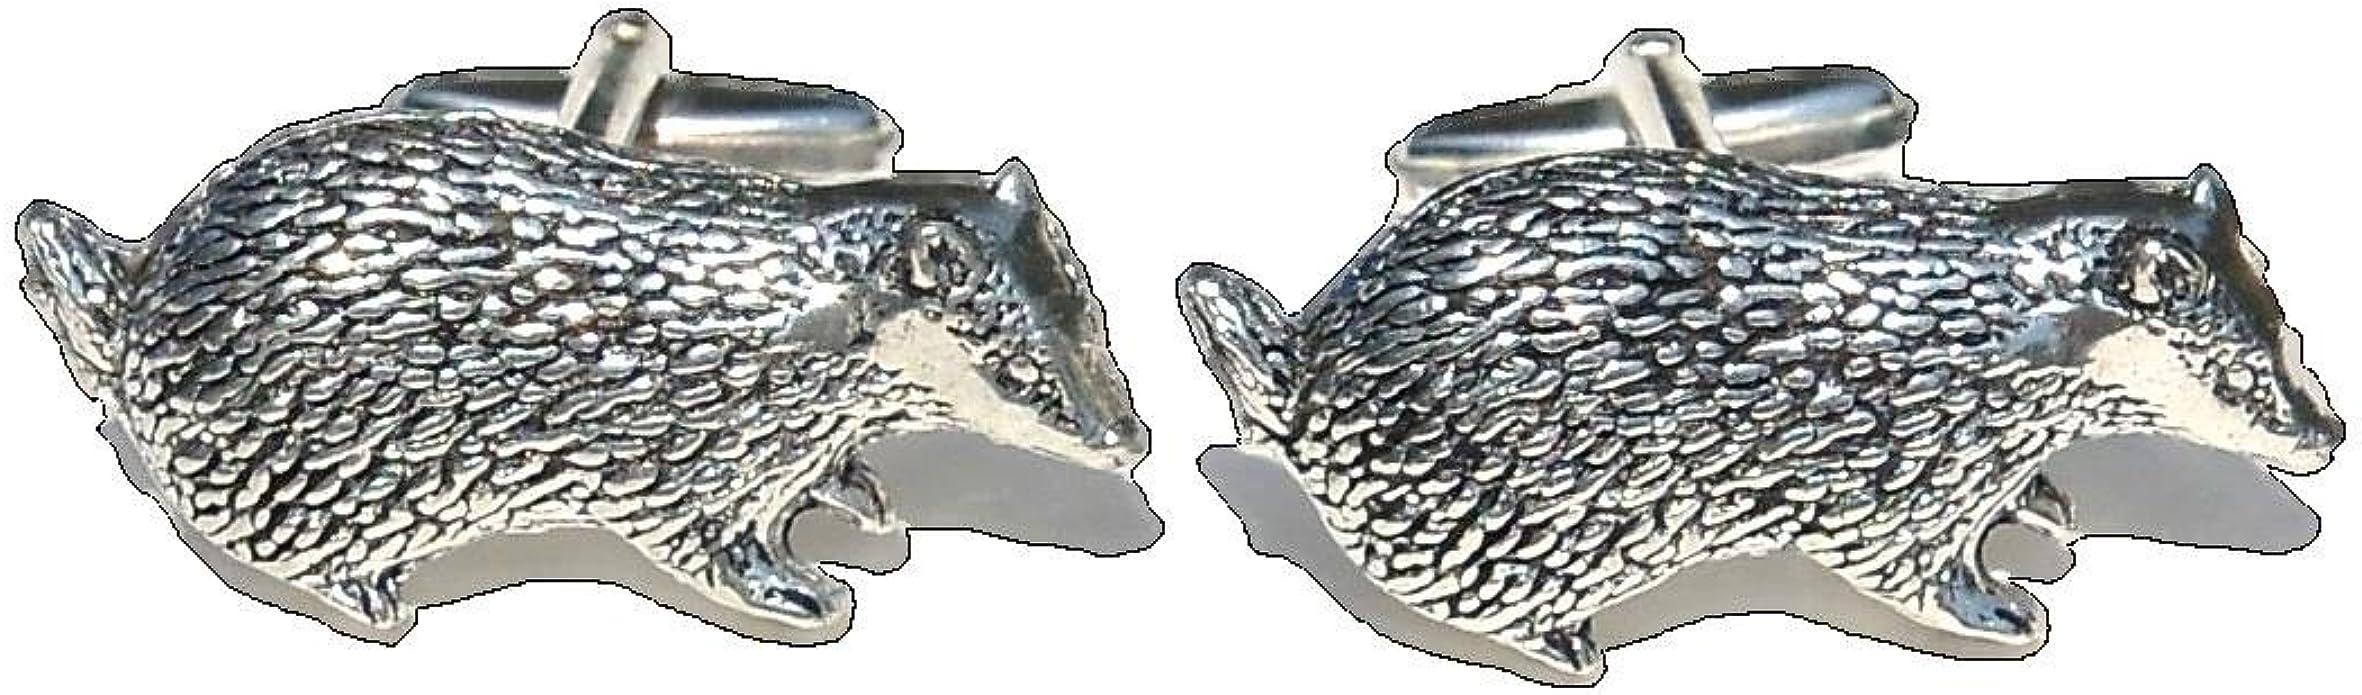 Badgers Cufflinks Antiqued Silver Pewter Cufflinks